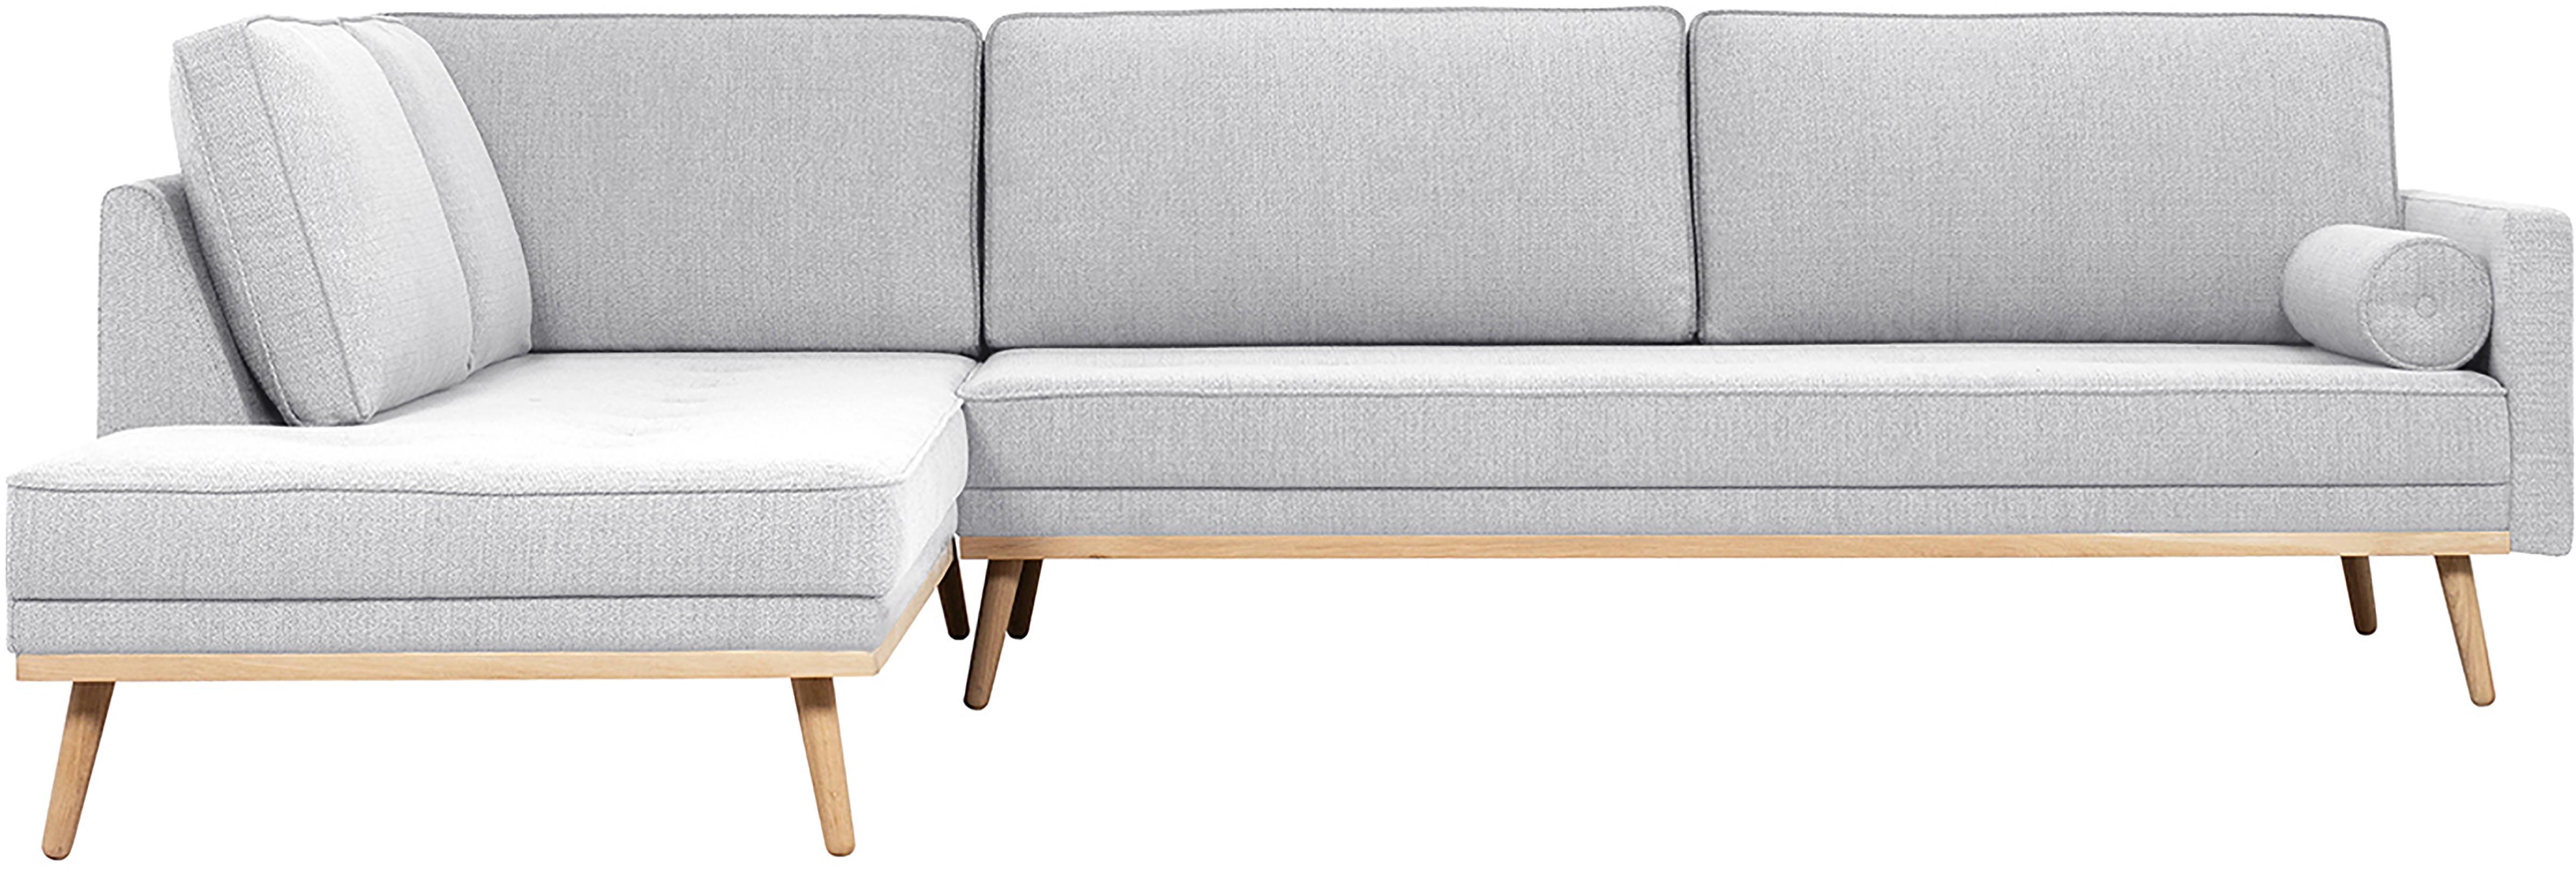 Ecksofa Saint (4-Sitzer), Bezug: Polyester Der hochwertige, Gestell: Massives Kiefernholz, Spa, Webstoff Hellgrau, 294 x 70 cm